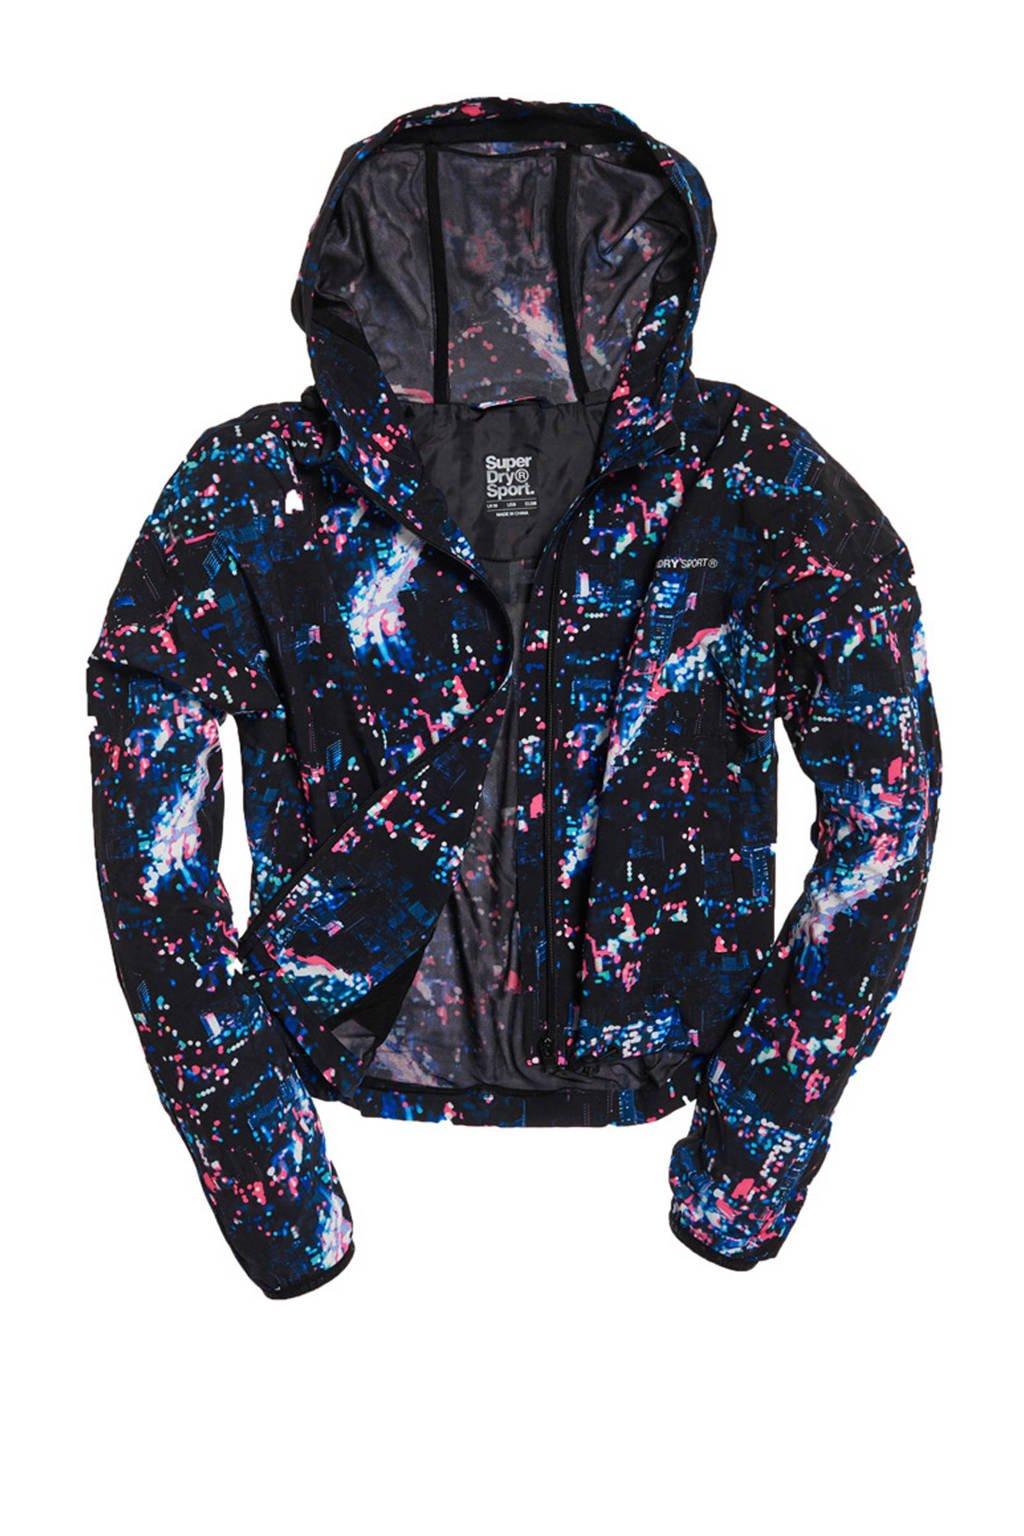 Superdry Sport jack zwart/blauw/roze, Zwart/blauw/roze